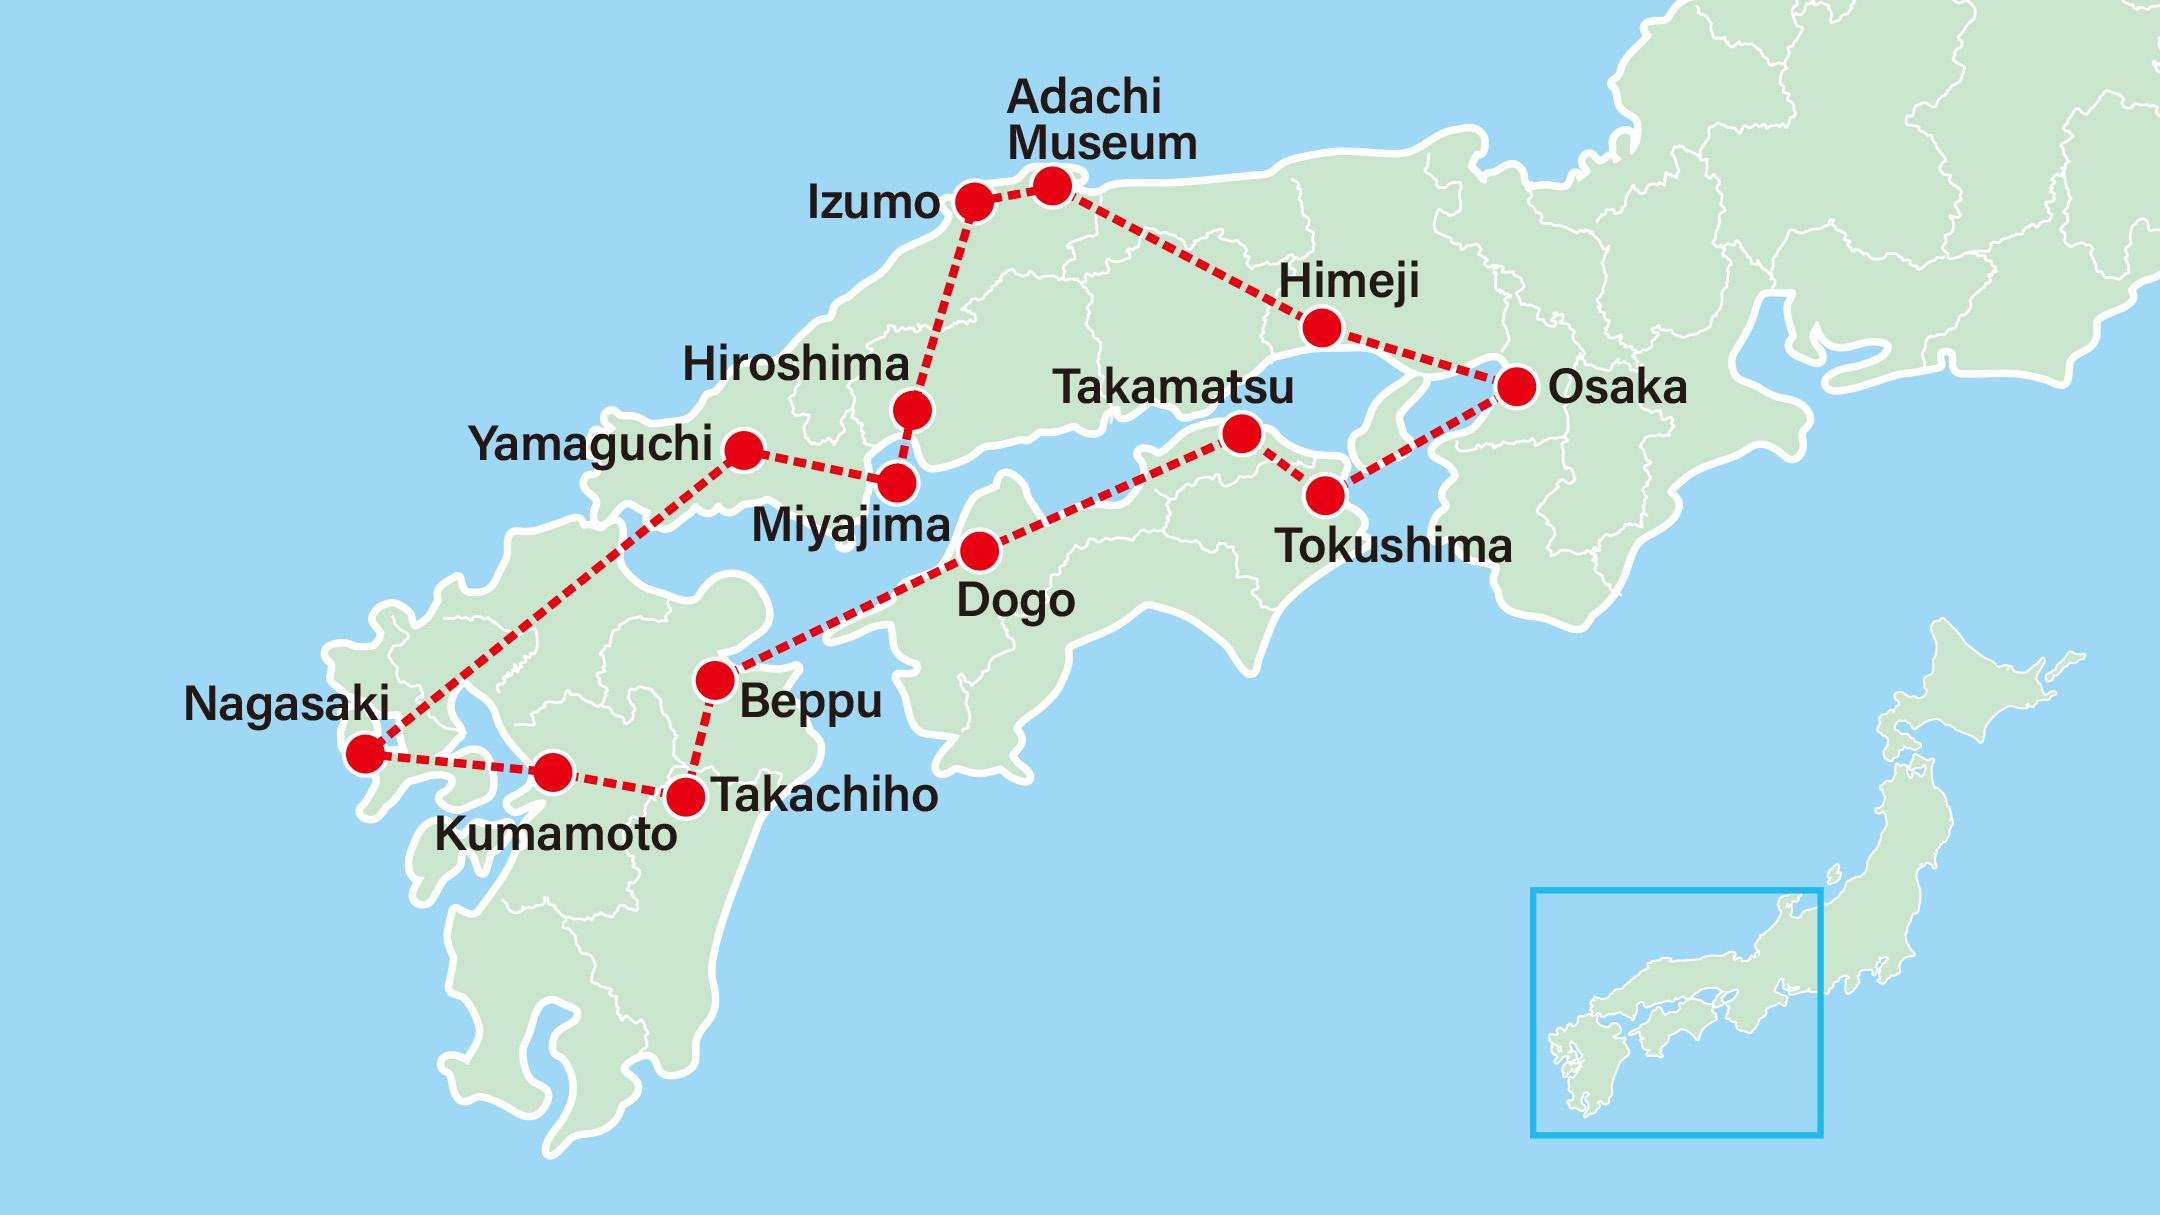 Southern Japan 8 Days-Himeji-Adachi Museum-Hiroshima-Miyajima-Kintai Bridge-Nagasaki-Kumamoto-Takachiho-Beppu-Dogo-Ritsurin Garden-Tokushima-Osaka